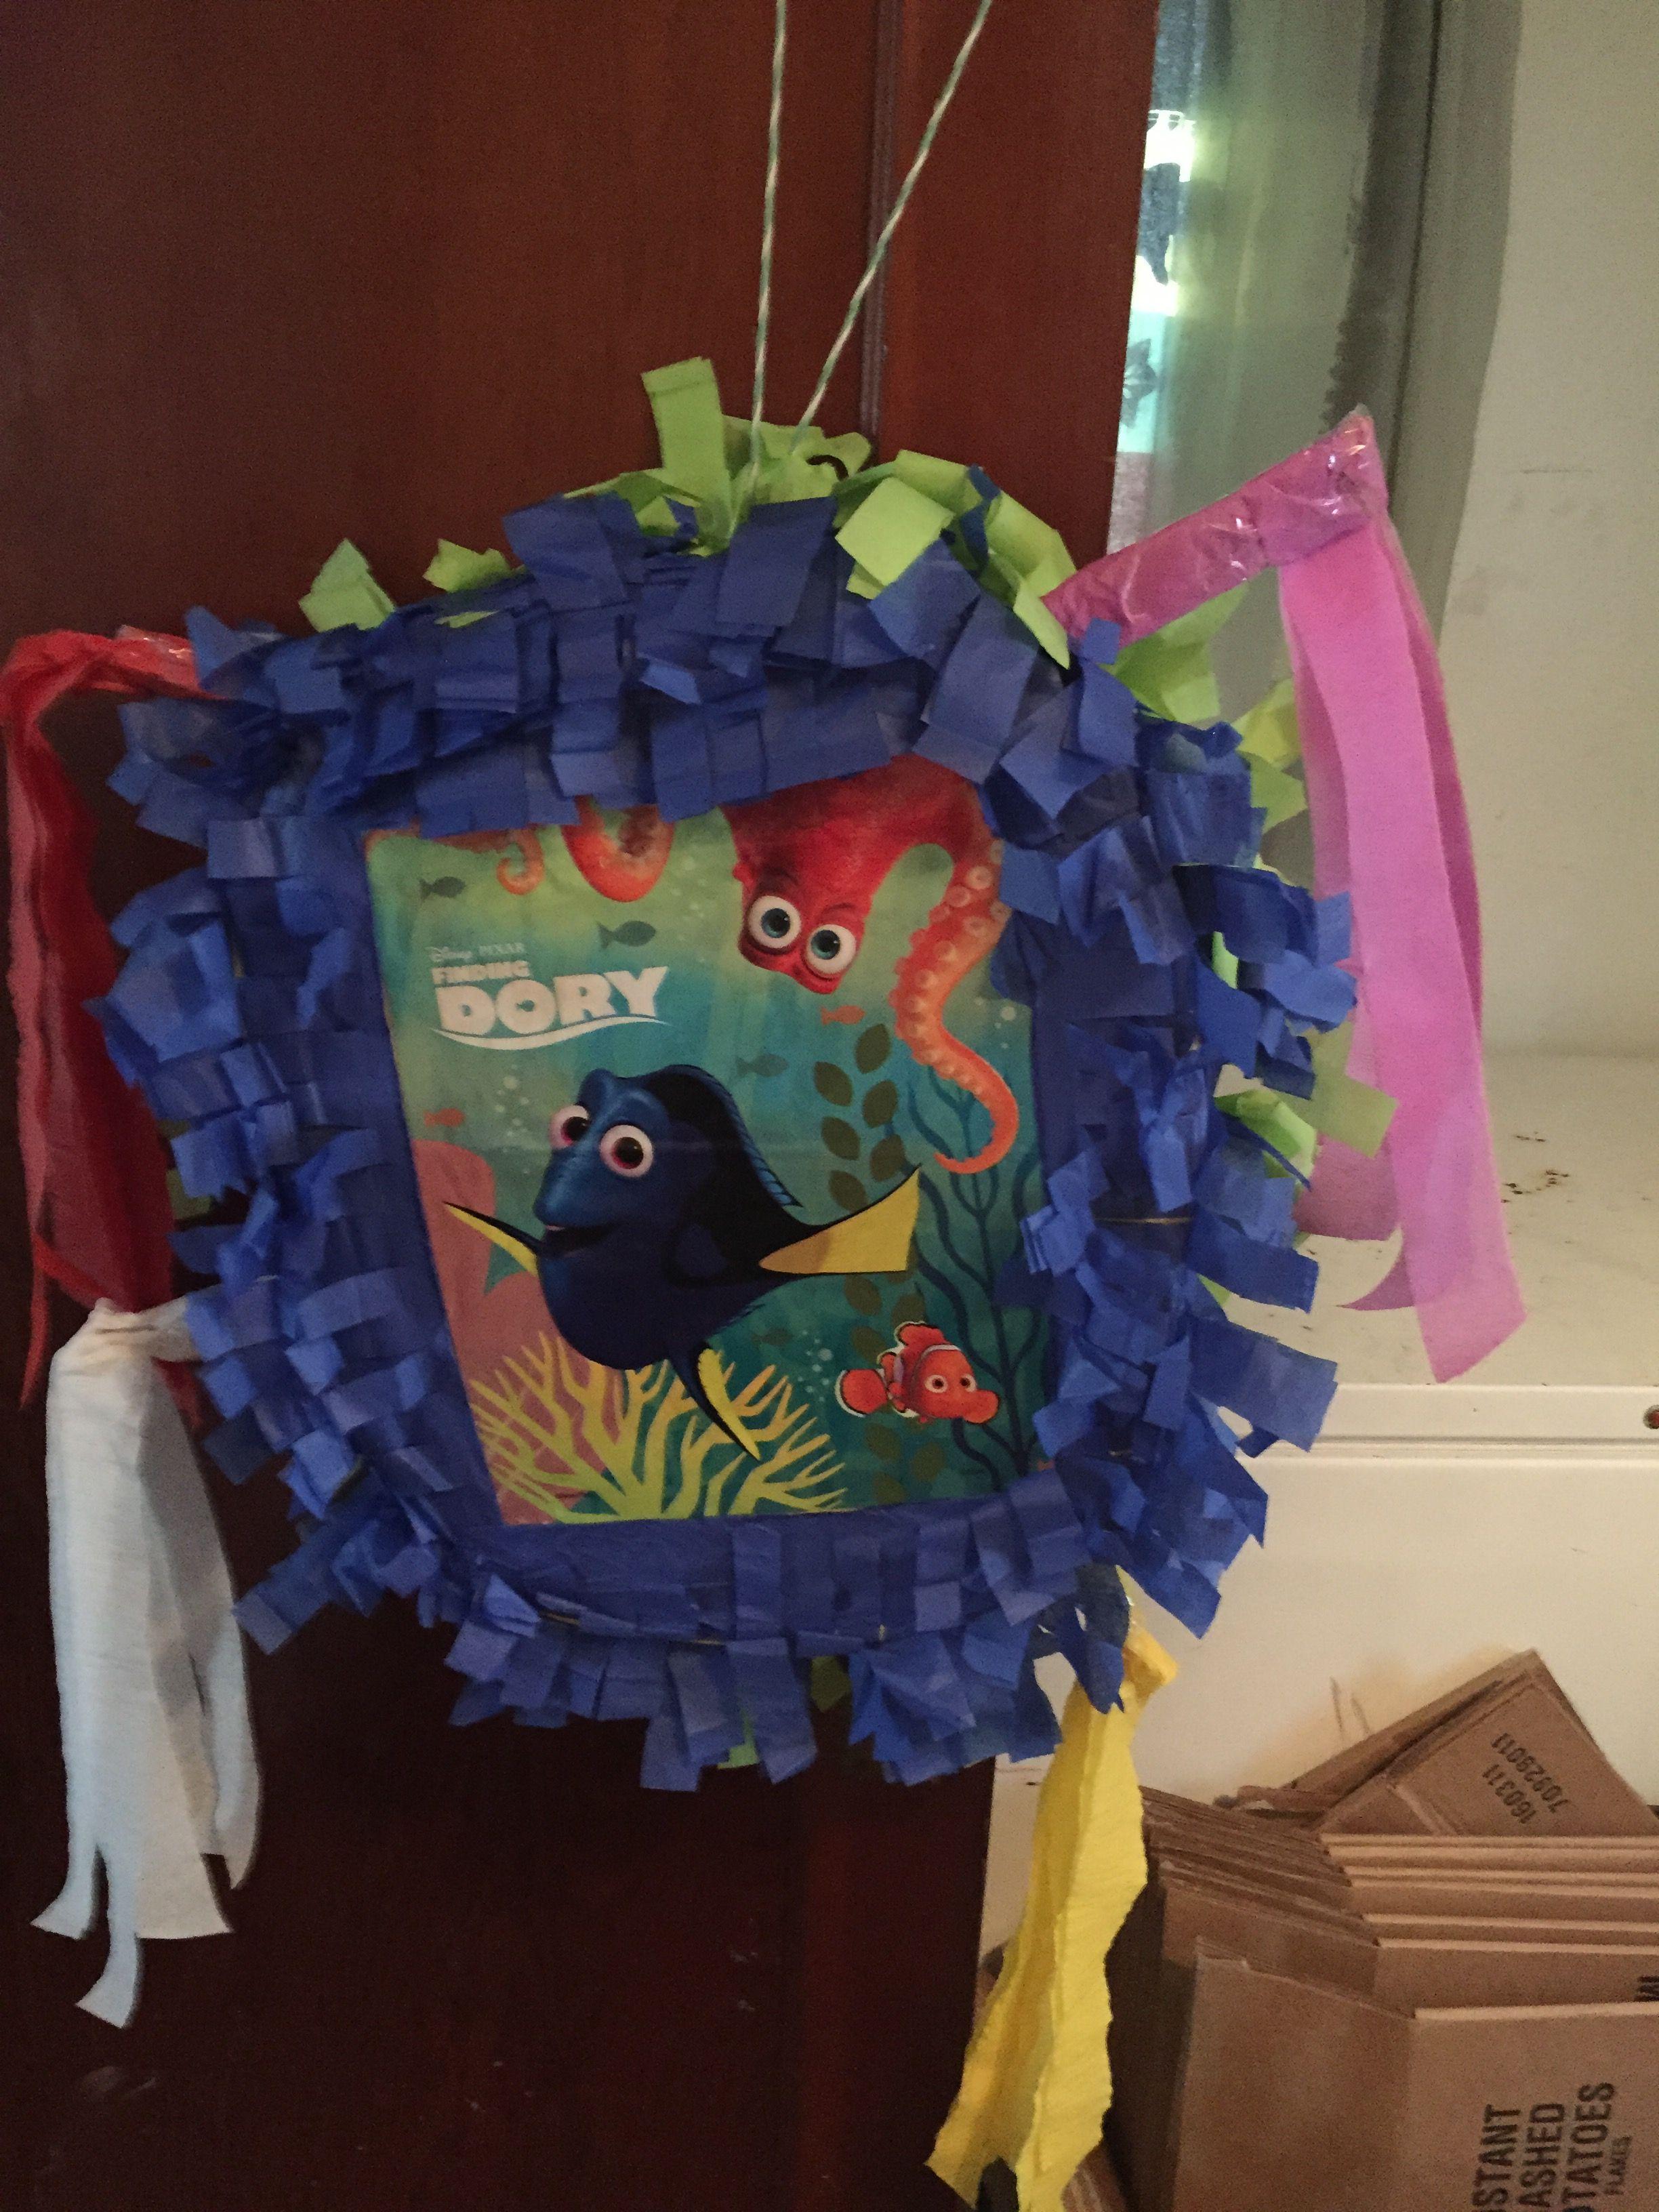 Pin by Michael McElhaney on Irma Halloween wreath